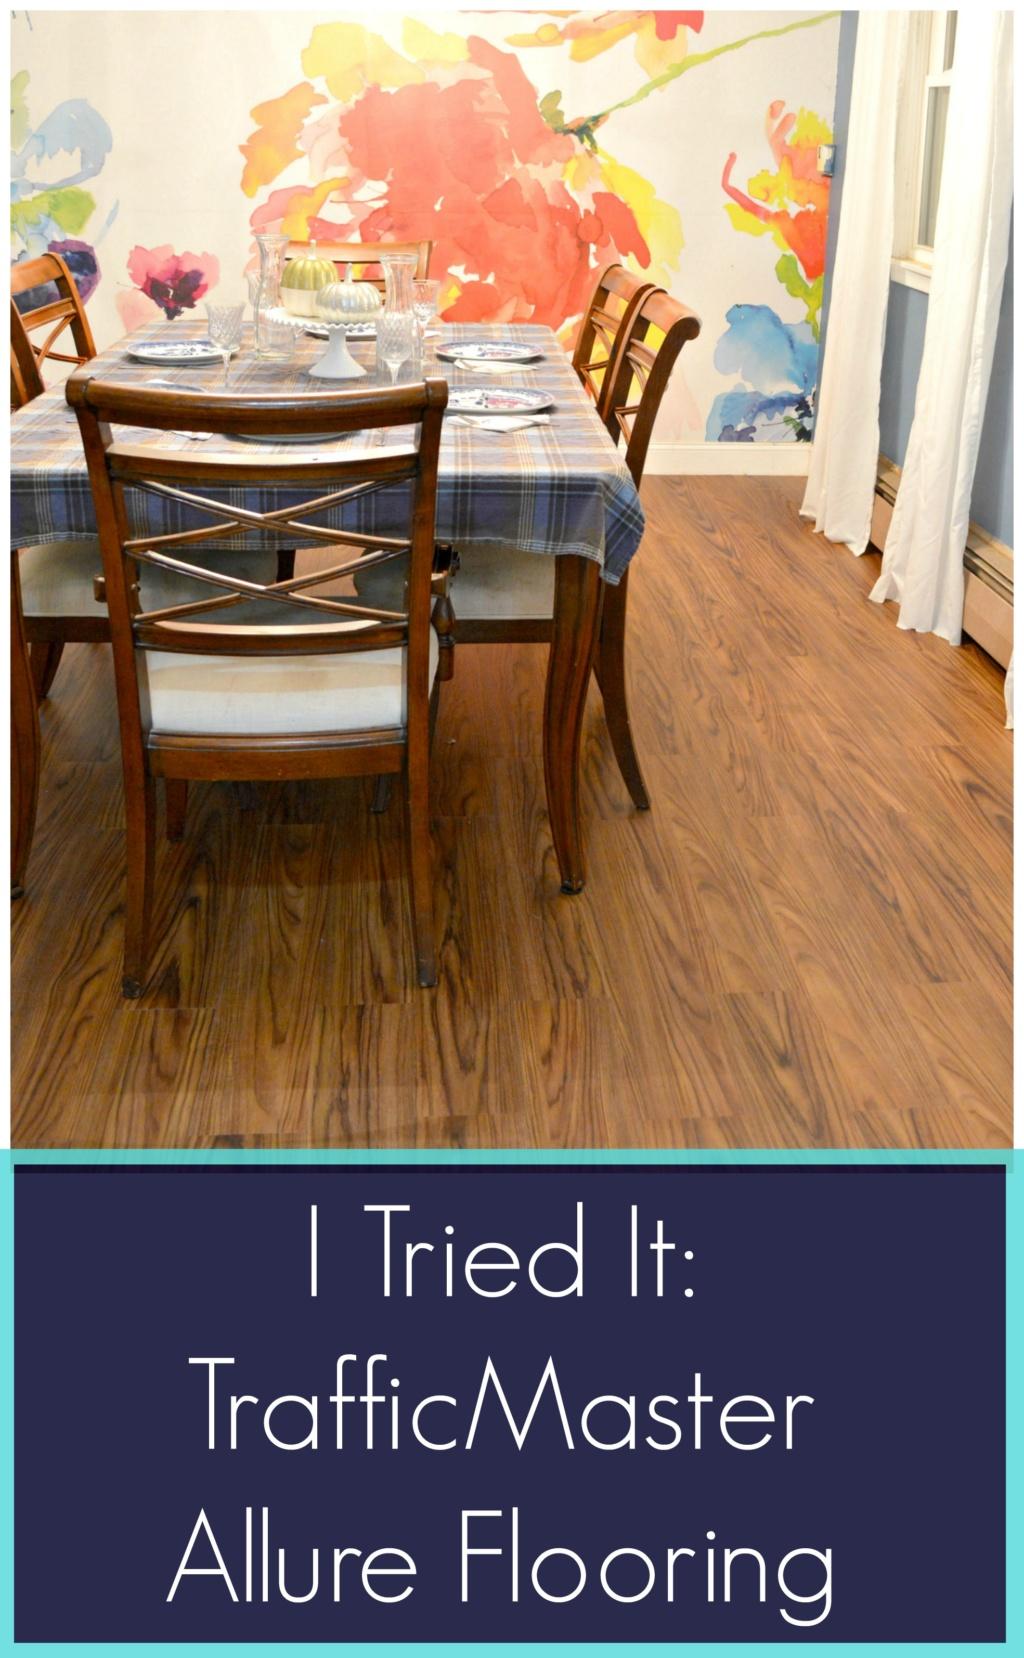 I Tried It – TrafficMaster Allure Flooring